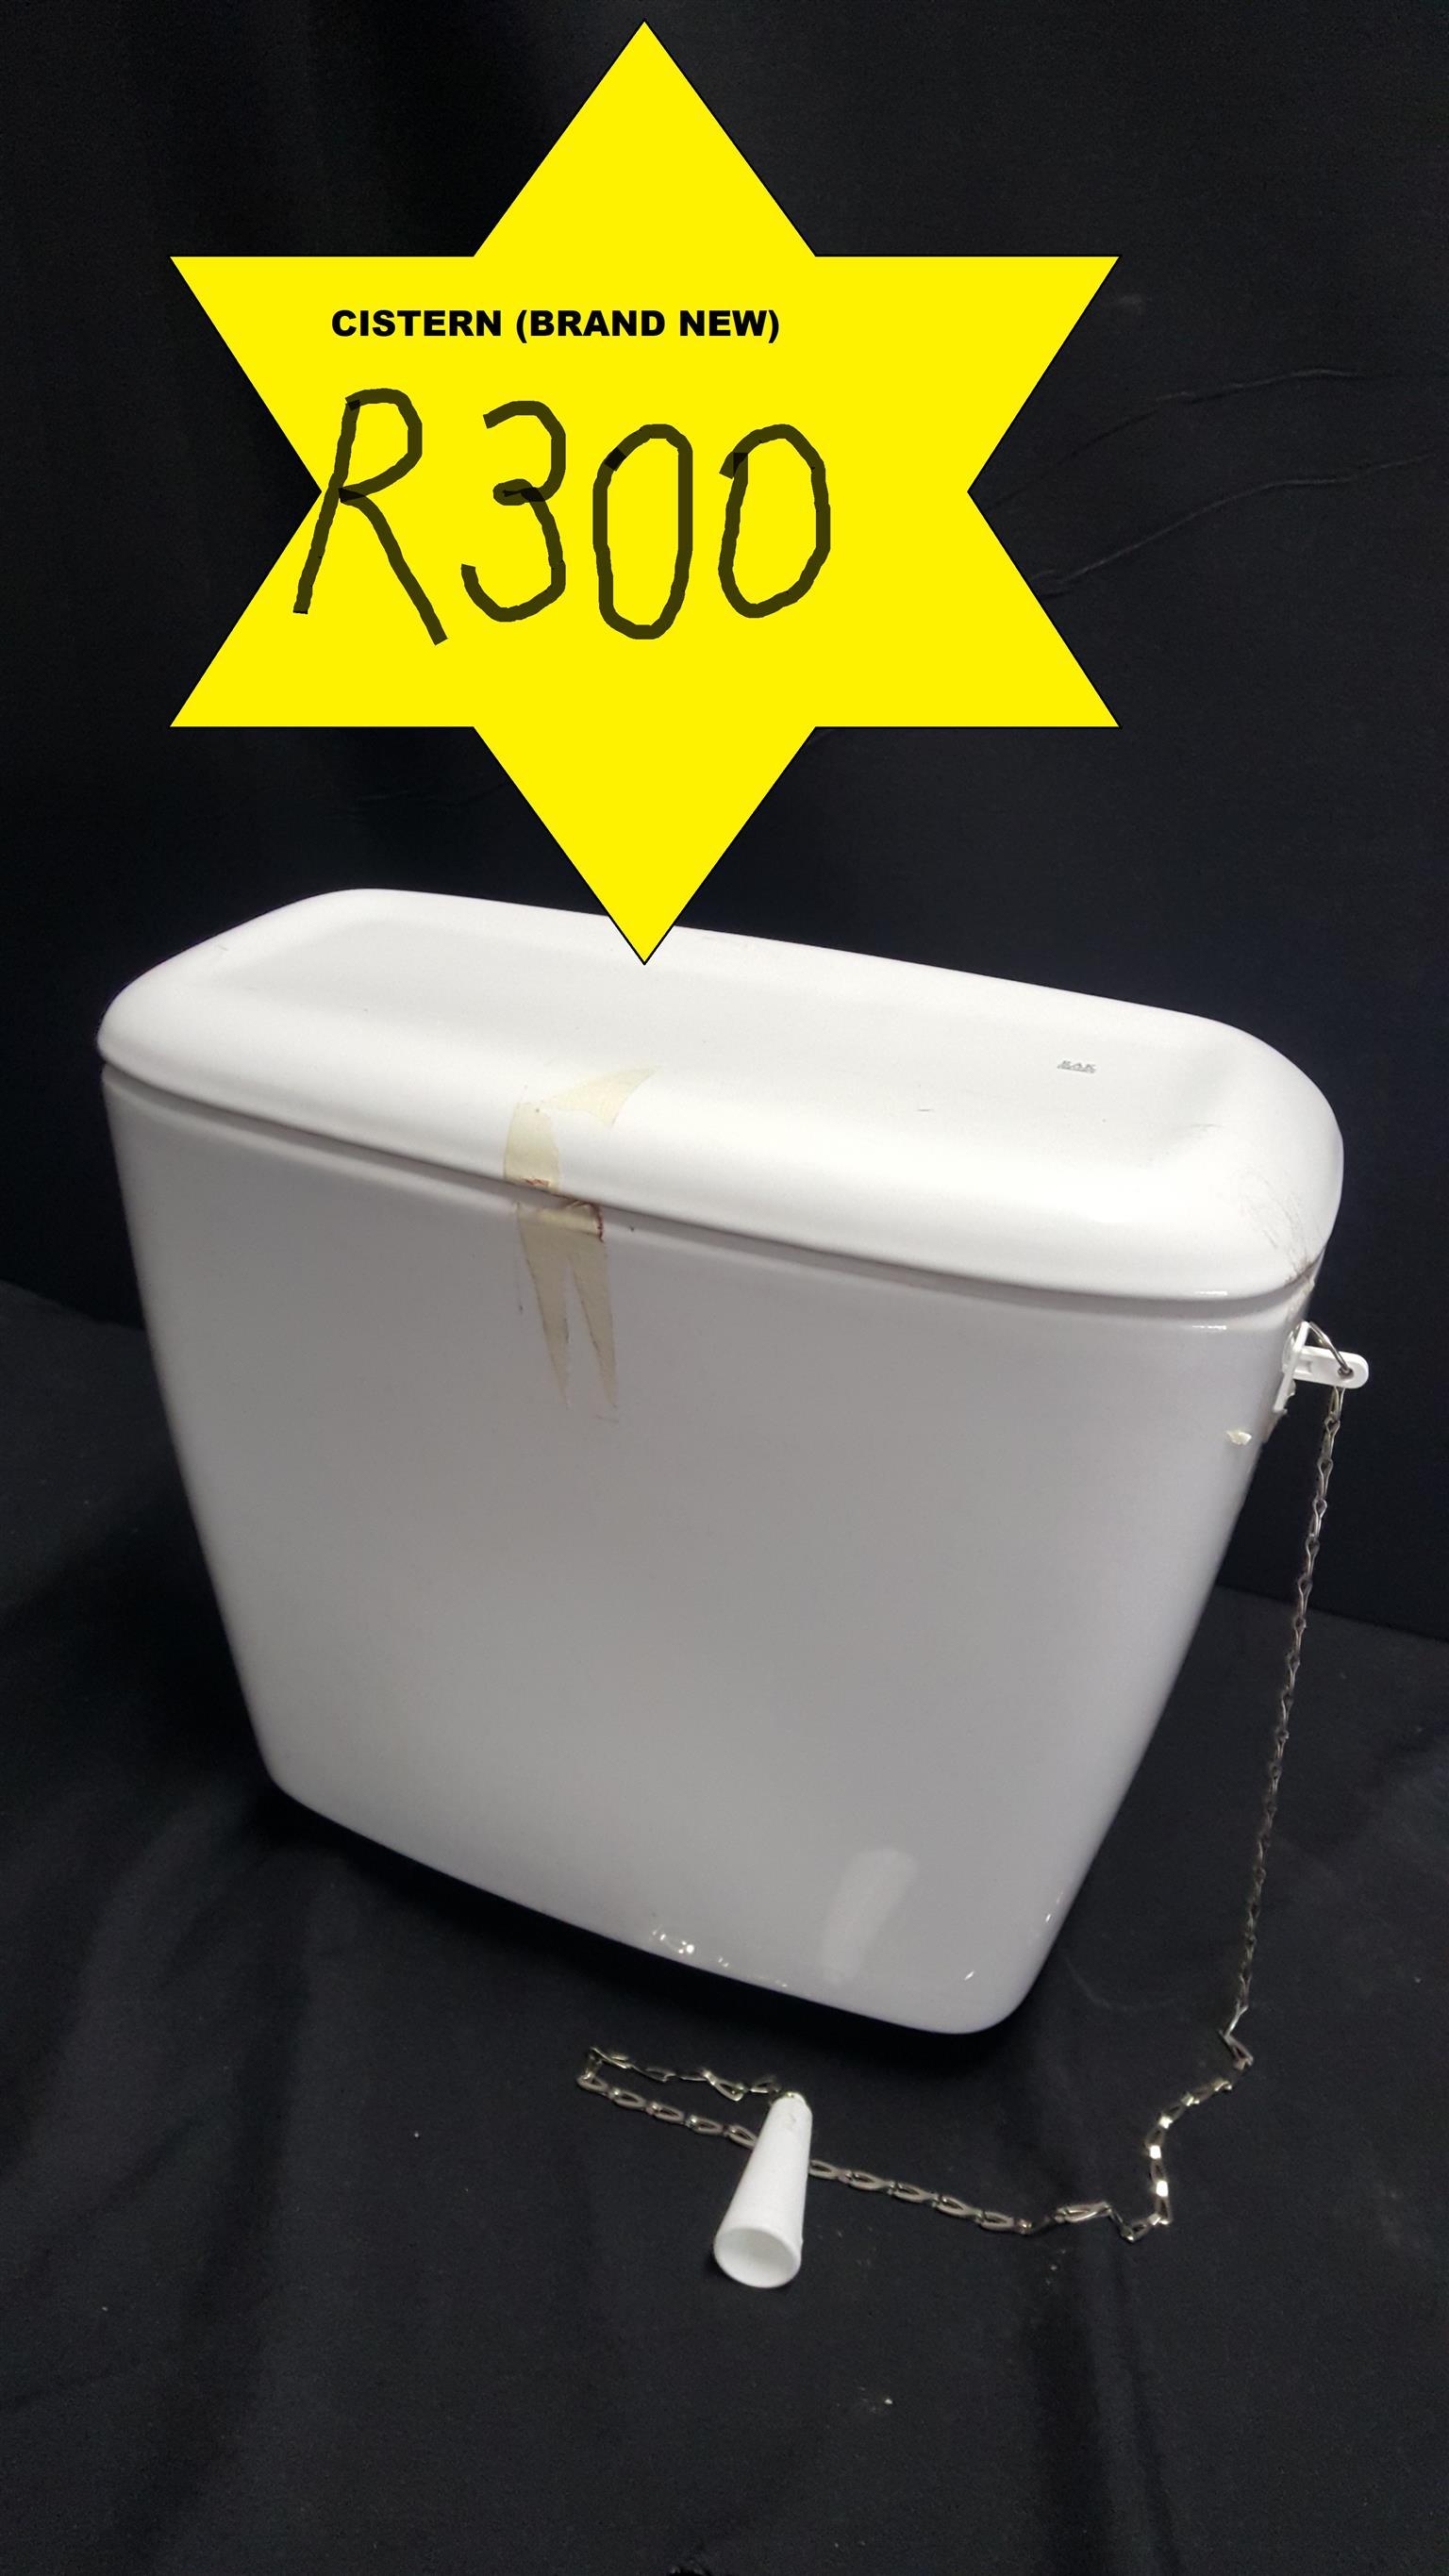 Toilet cistern | Junk Mail